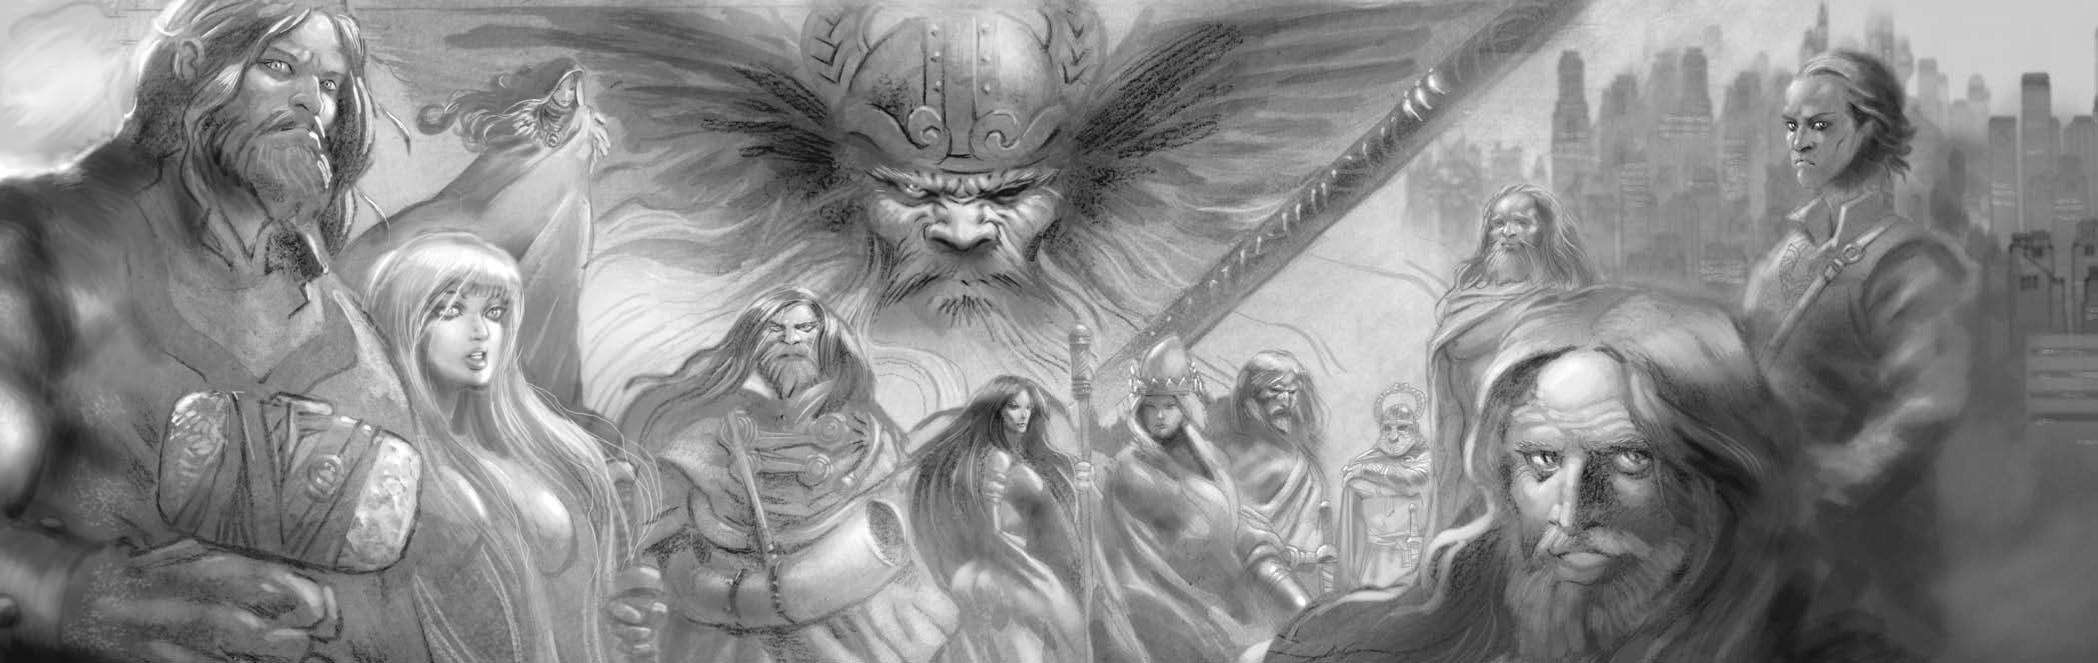 "norse pantheon ""Aesir"" (e Vanir) da sinistra: Thor, Sif, Hel, Heimdall, Freya, Frigga, Frey, Vidar, Tyr, Baldur, Loki, Odino (dietro) Scion - Hero (2007-04) © White Wolf Publishing"